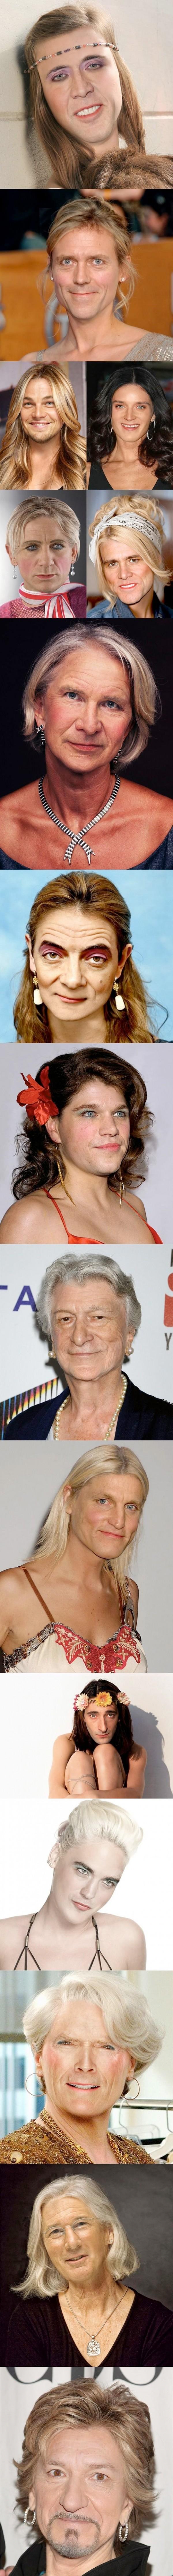 Actores famosos como mujeres